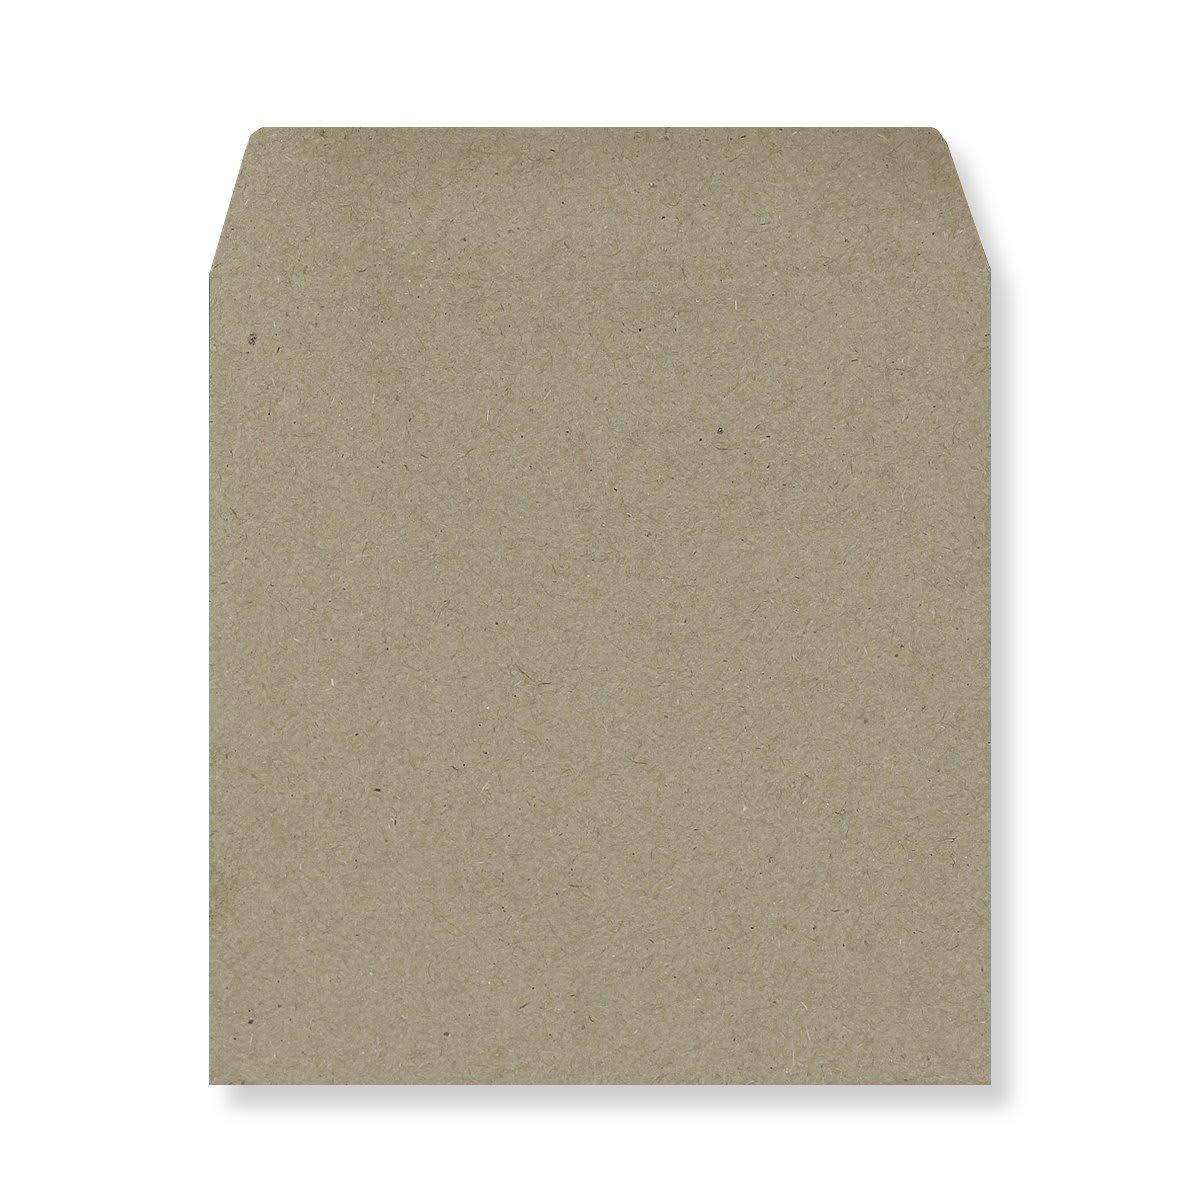 MANILLA WAGE POCKET ENVELOPES 108 x 102mm (Unprinted)